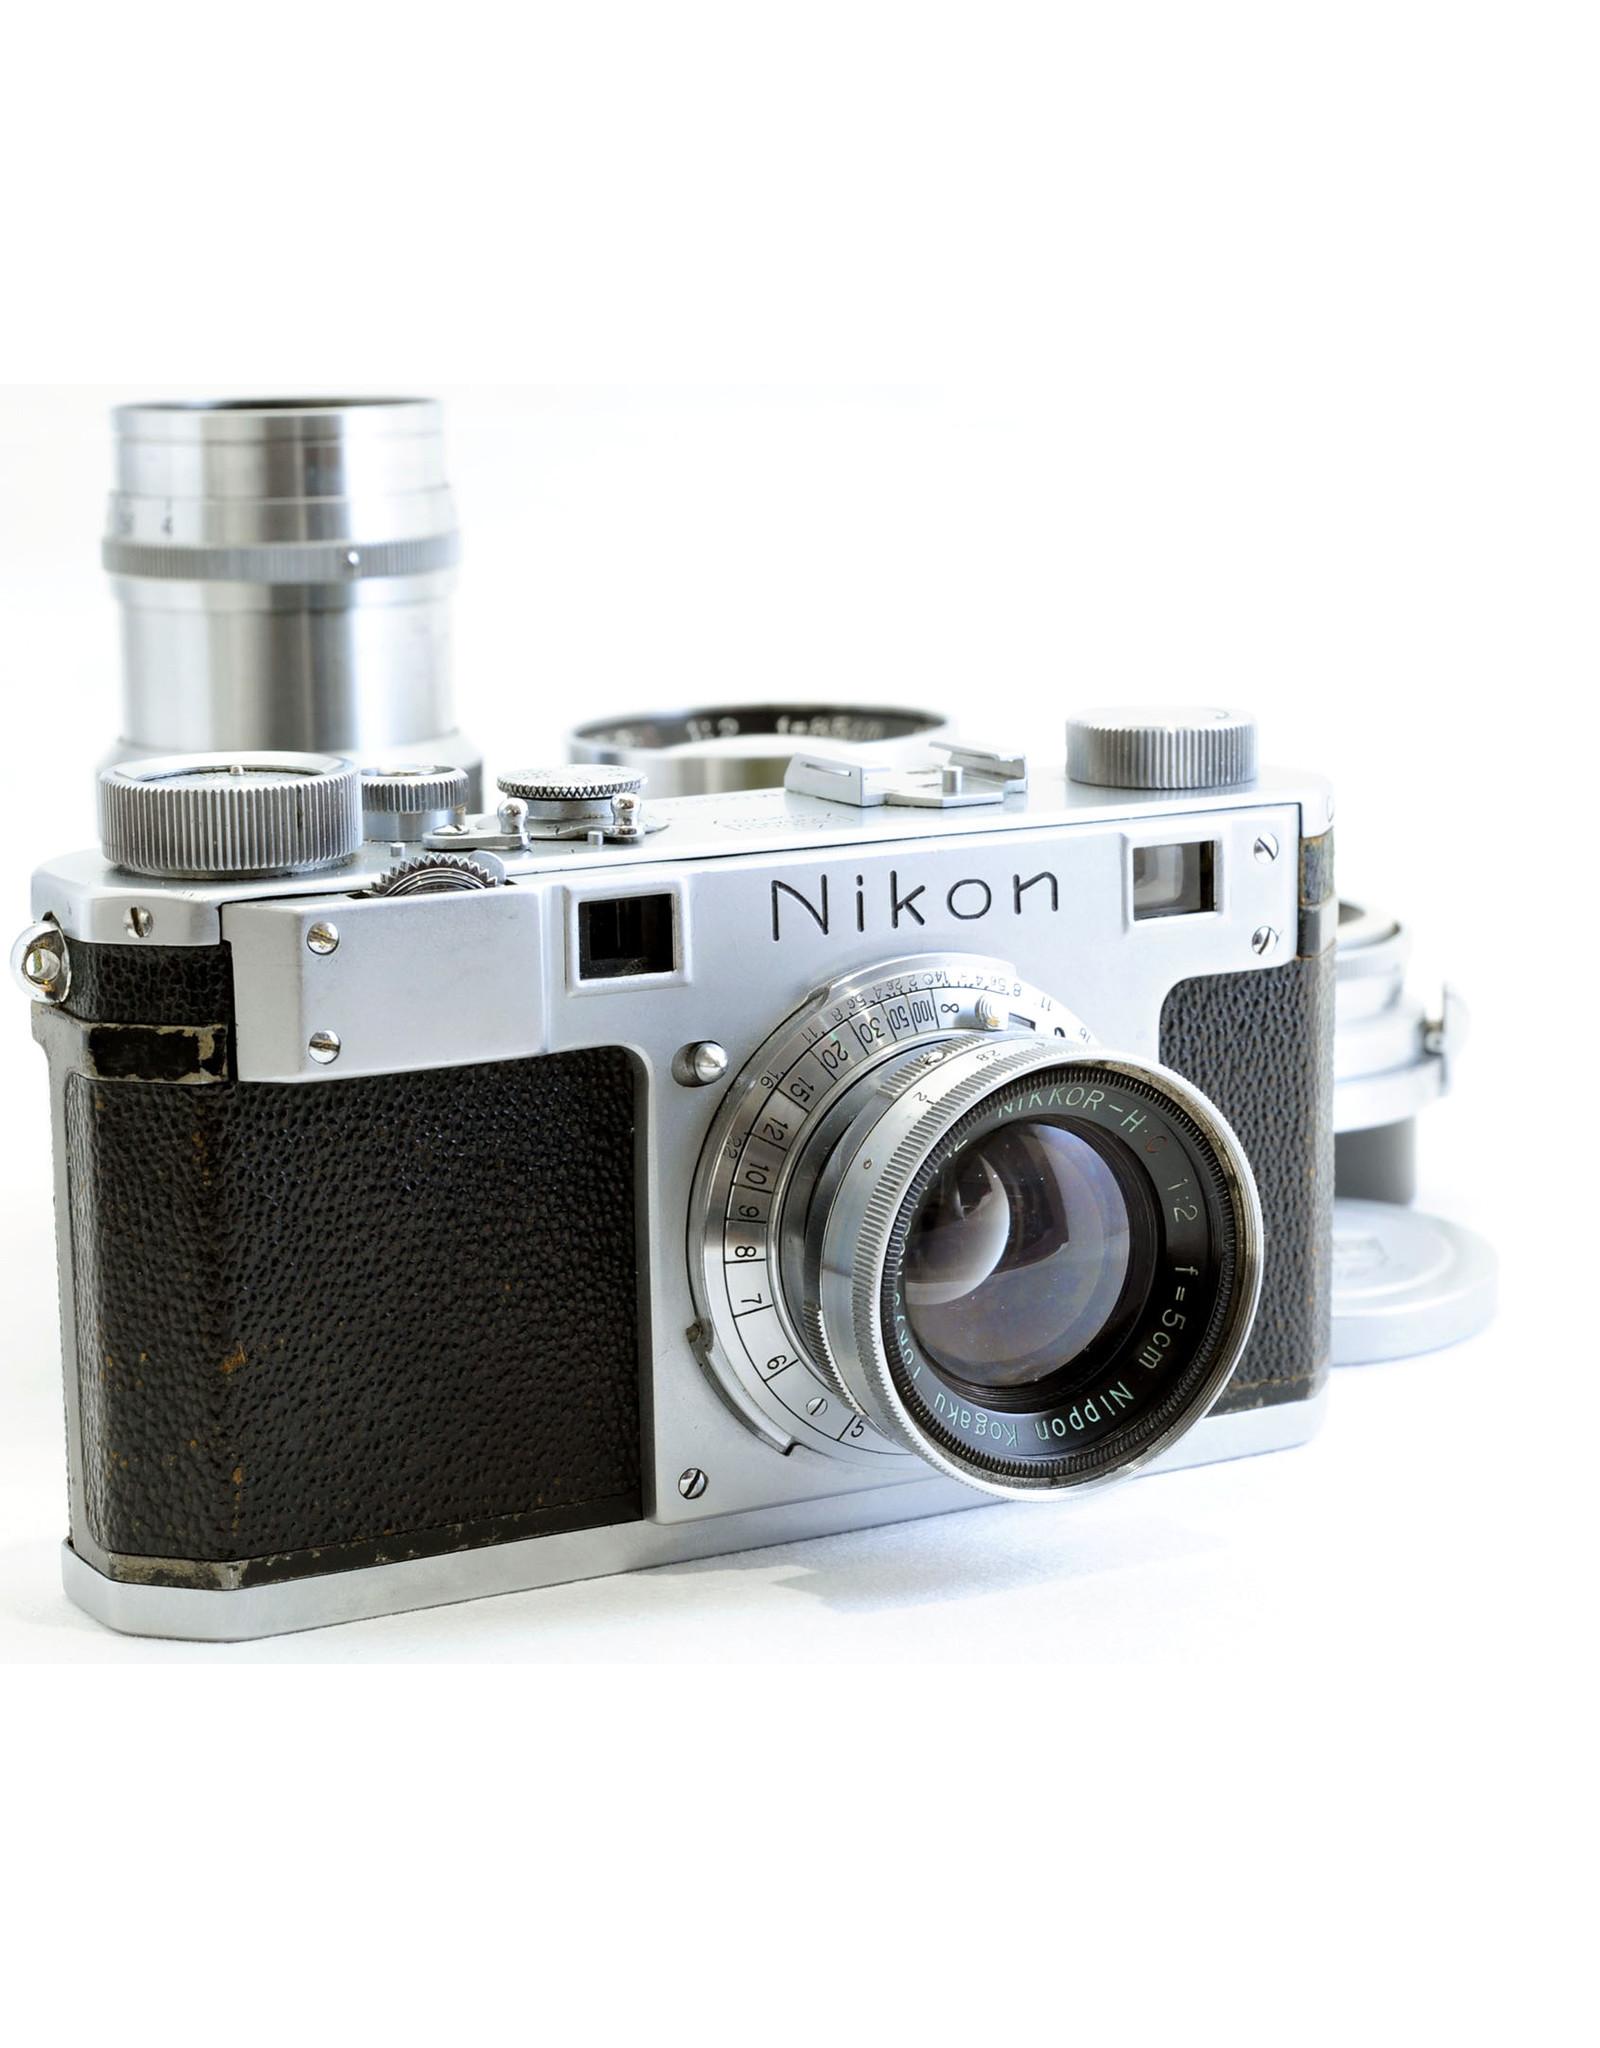 Nikon Nikon M outfit: 5cm f2, 3.5cm f3.5, 8.5cm f2, 13.5cm f4   ALC105914